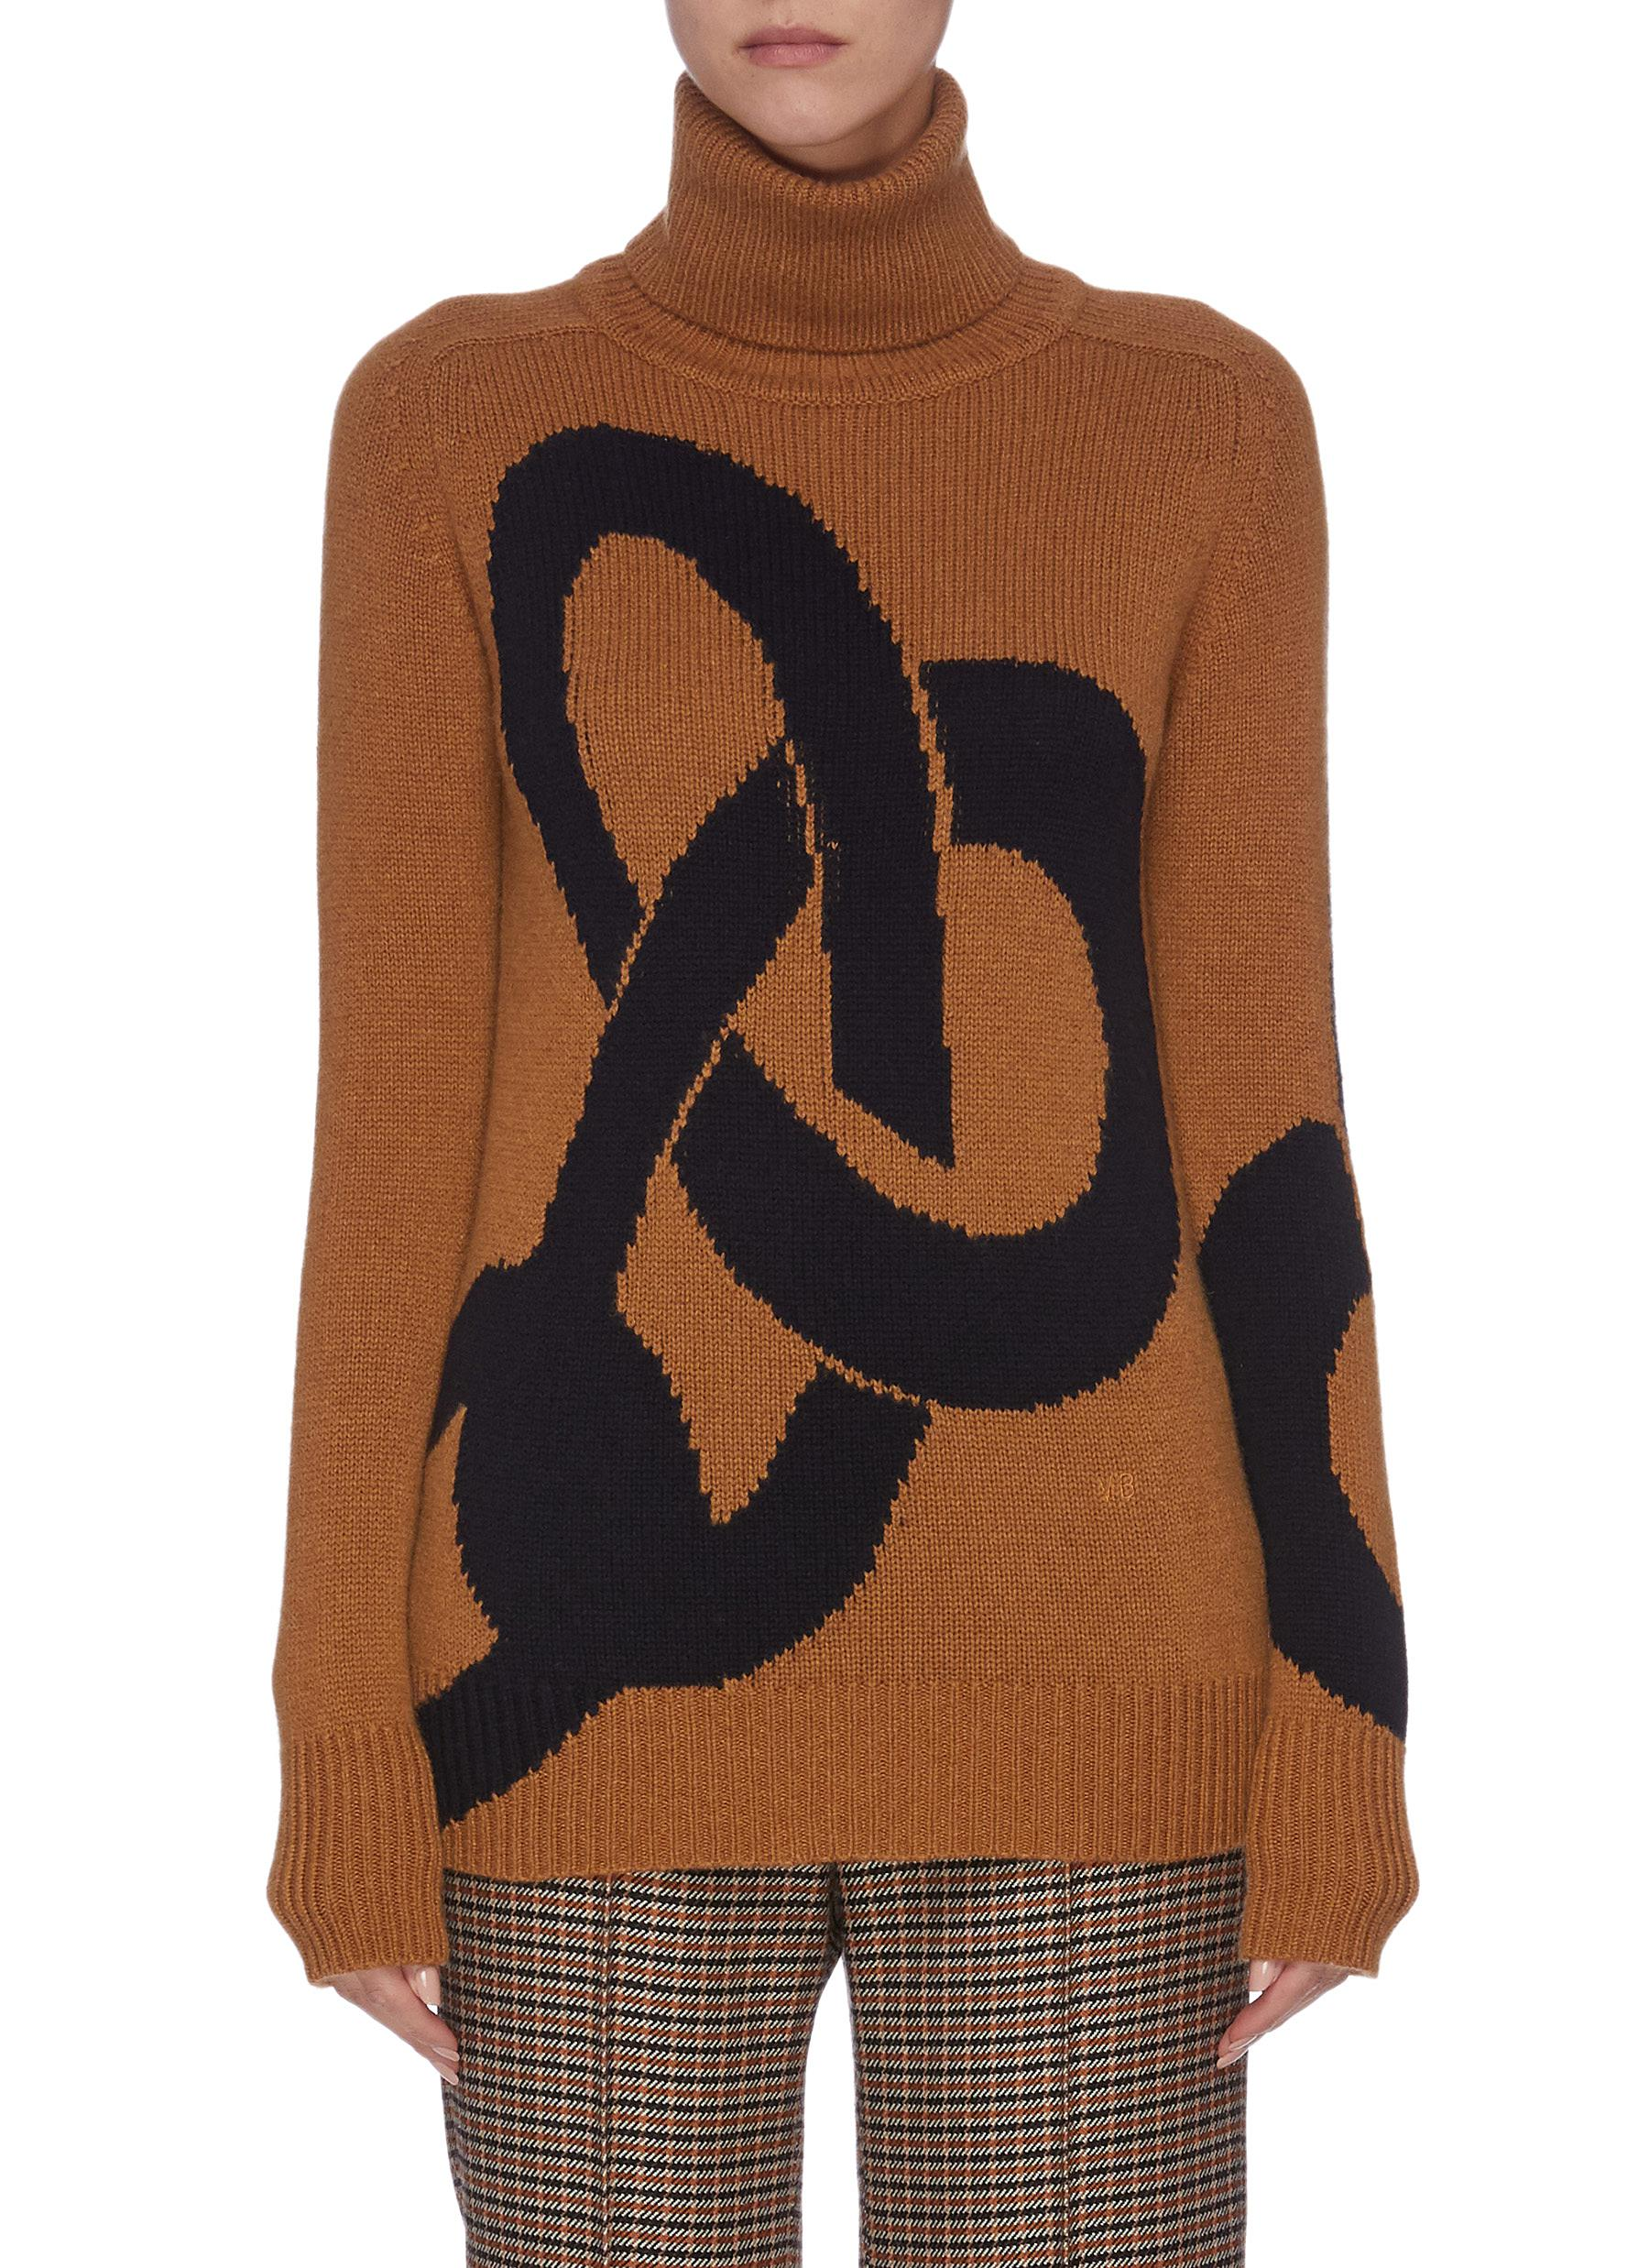 Intarsia cashmere turtleneck sweater by Victoria Beckham